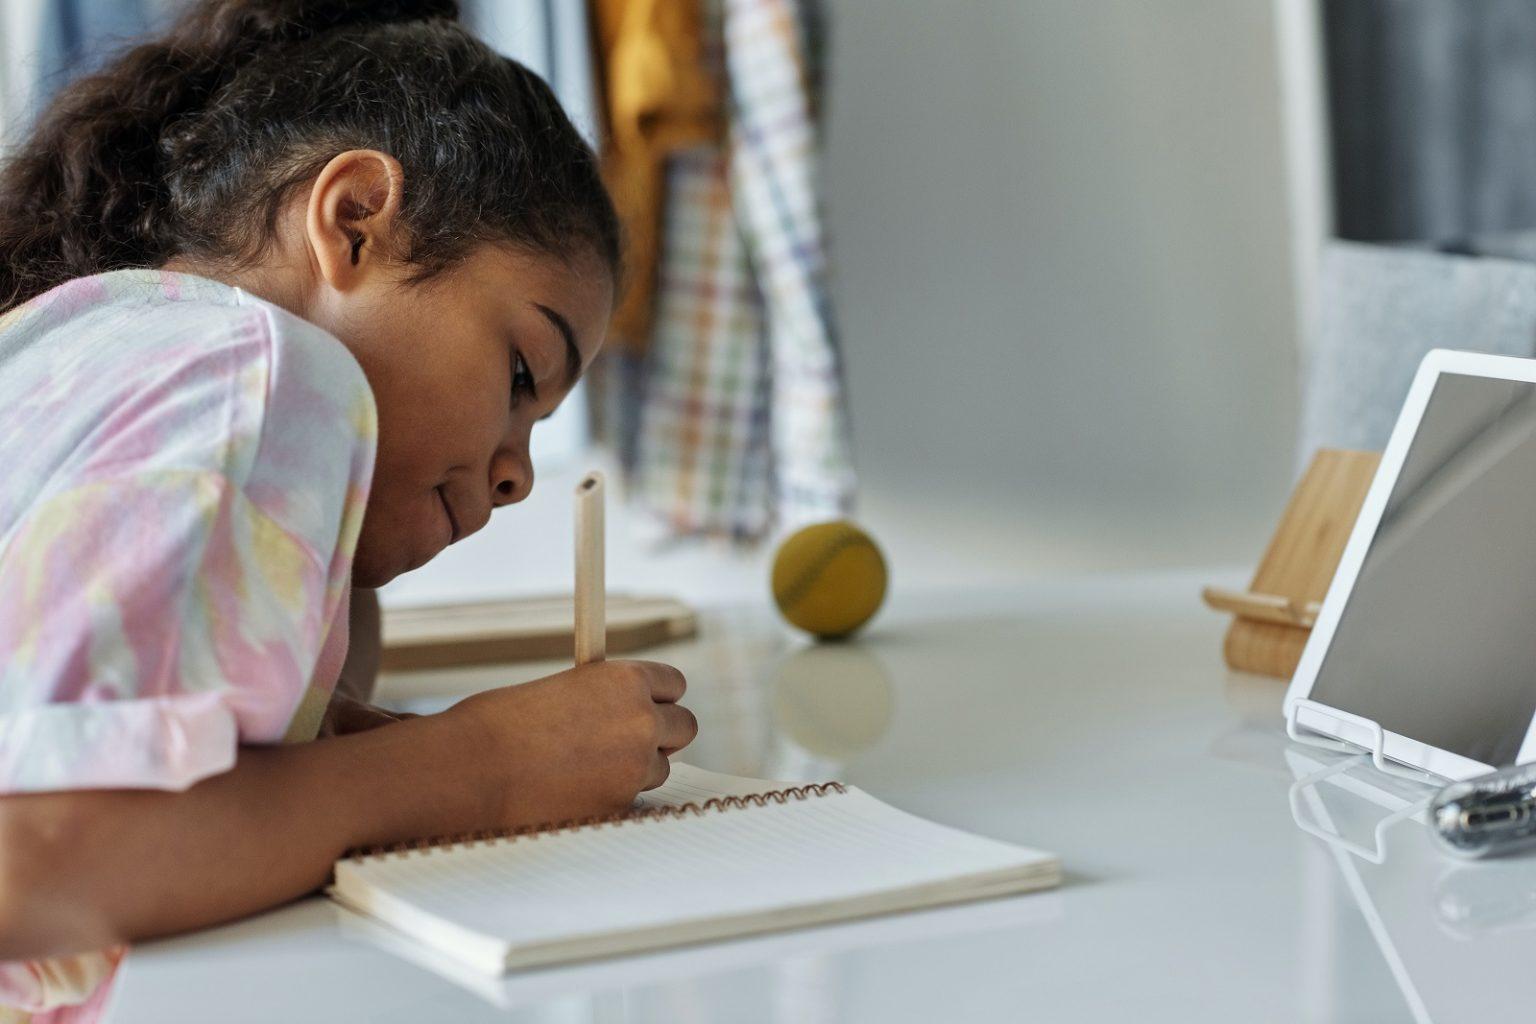 experiência dos alunos no ensino a distância